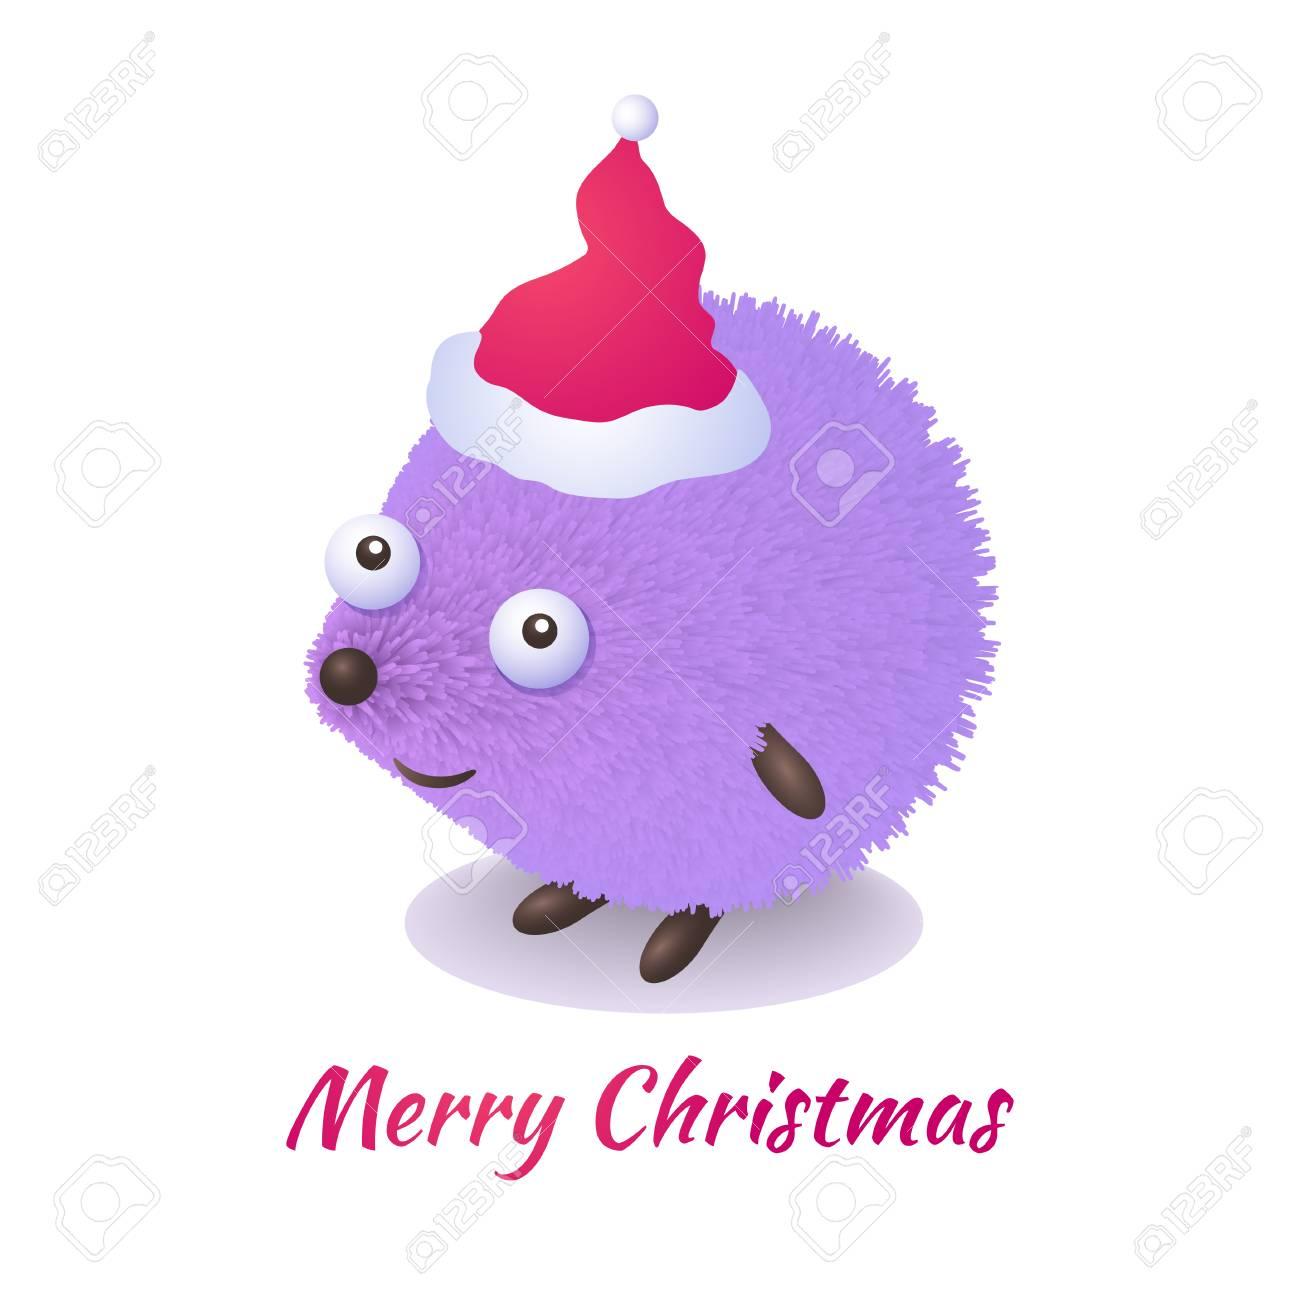 Erizo De Dibujos Animados Lindo Felicita En Navidad. Tarjeta De ...